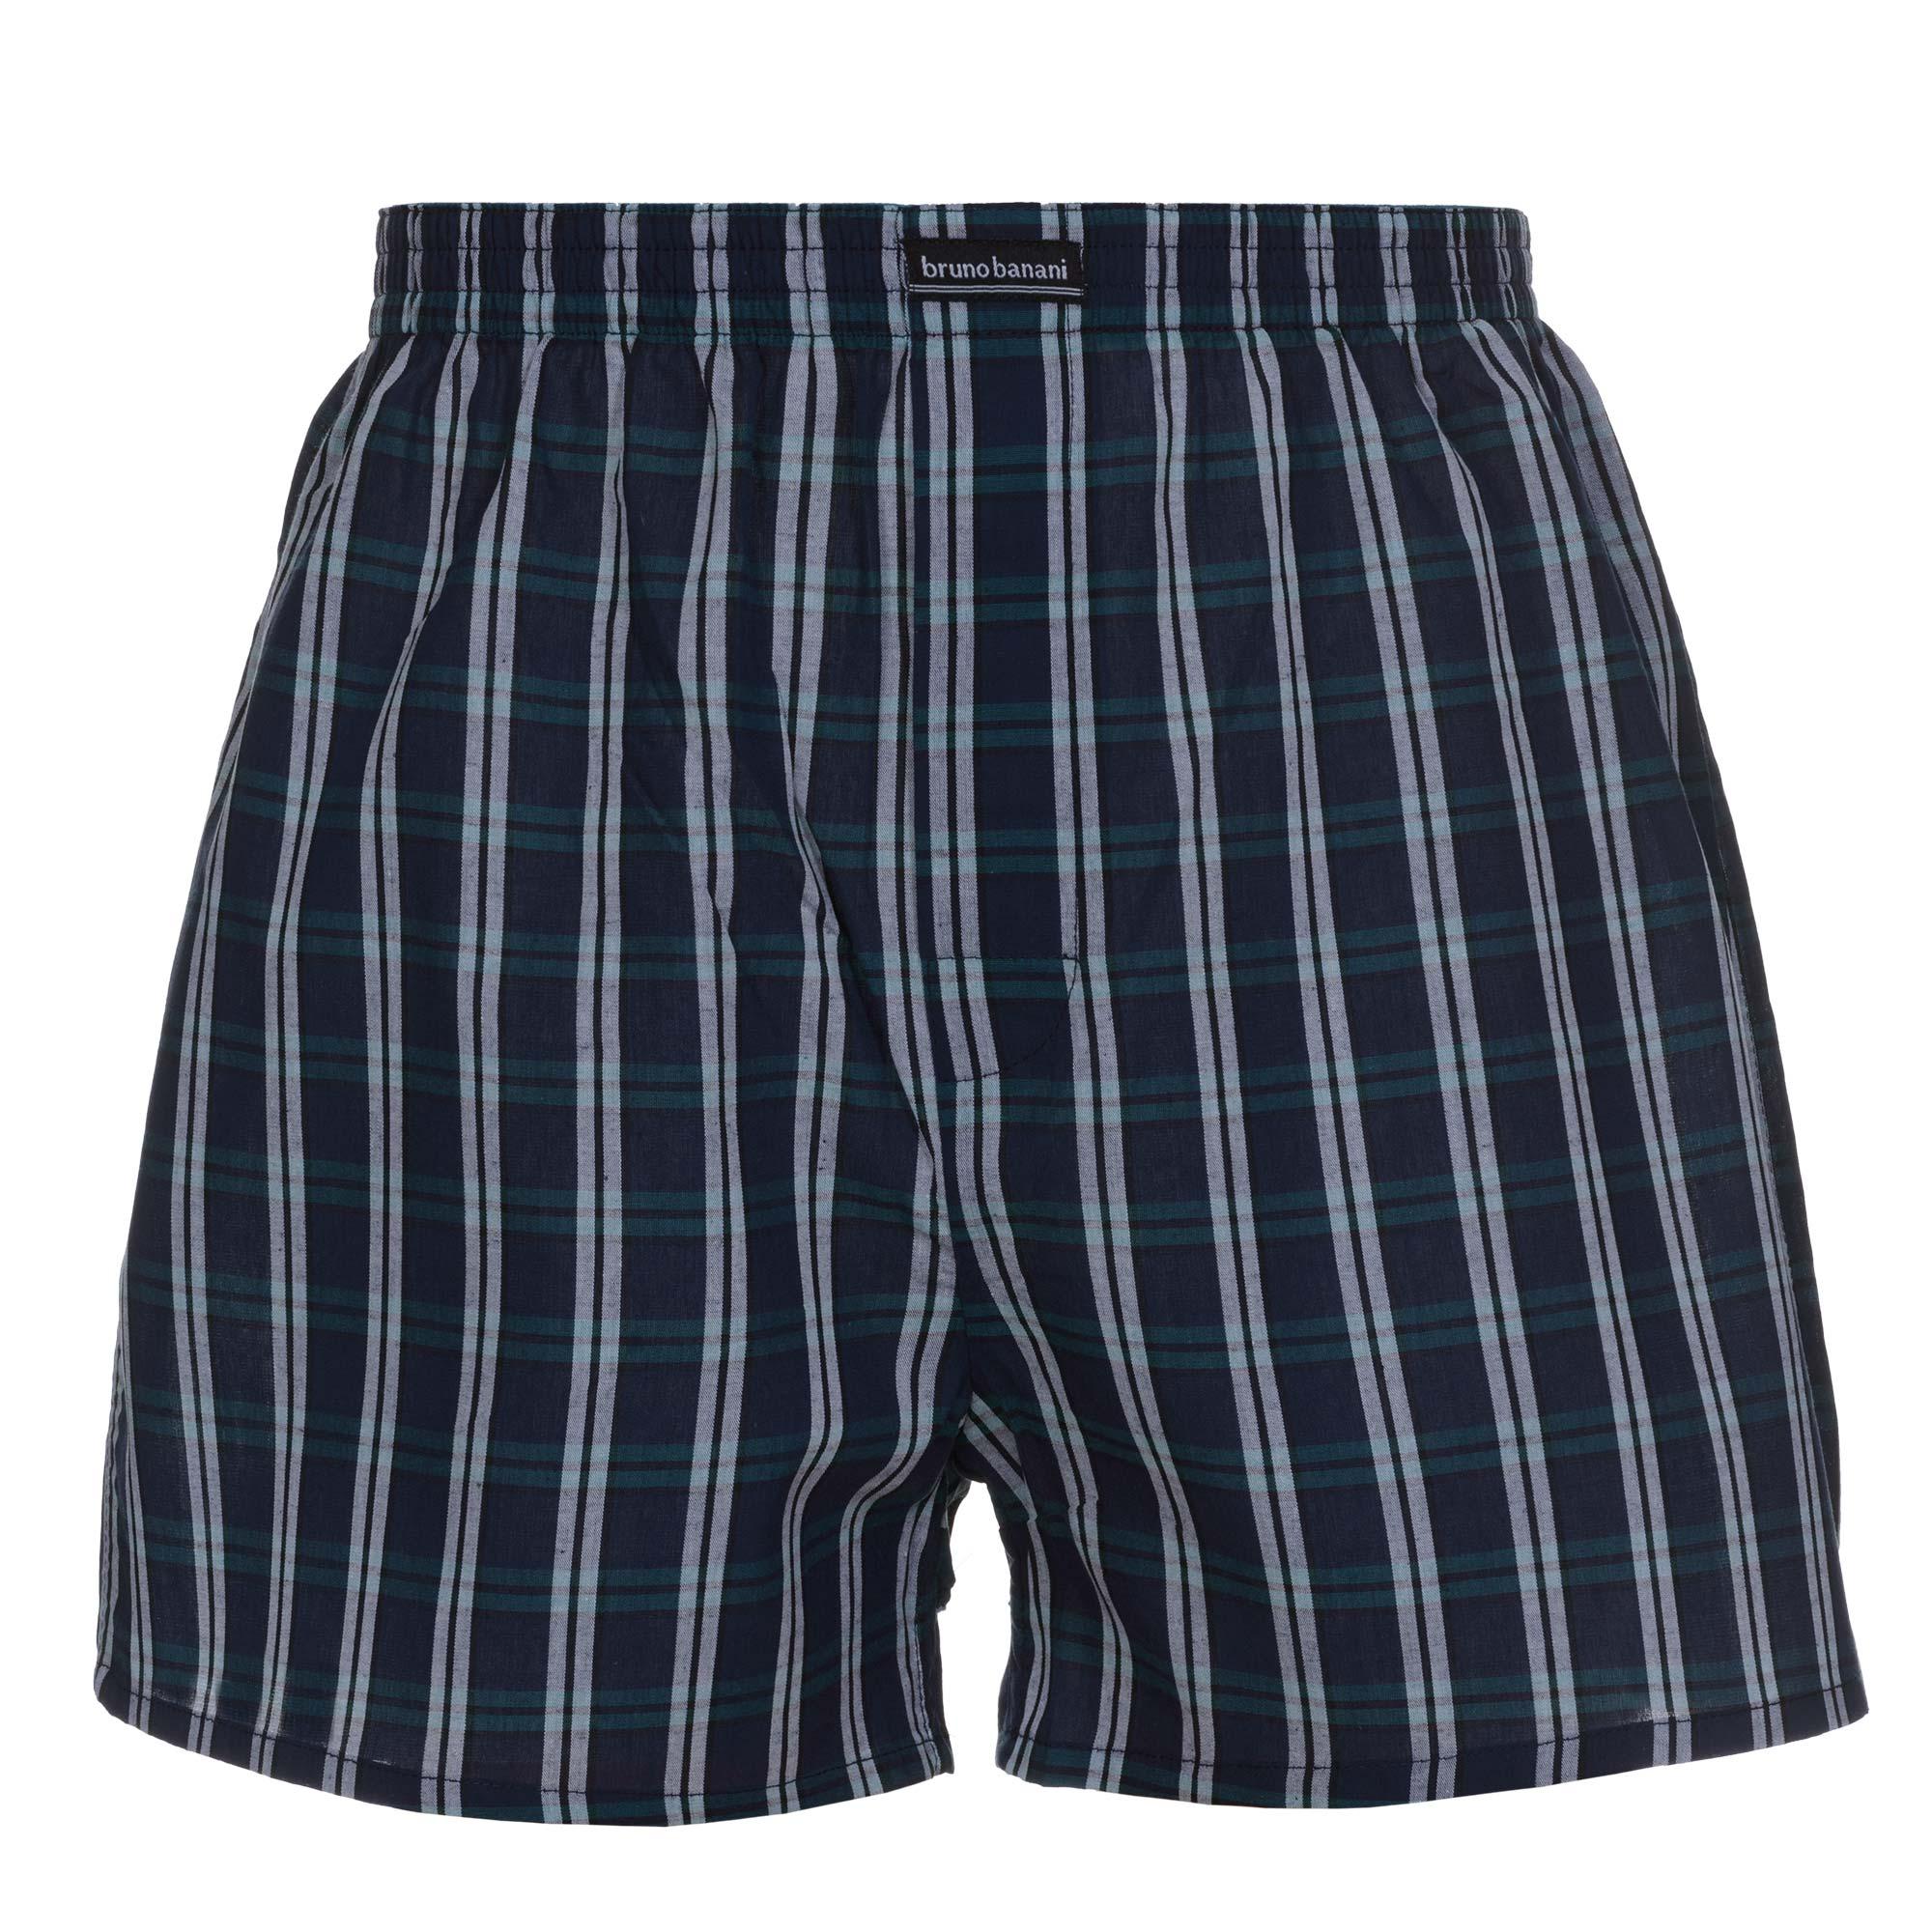 5604a1b830ce39 Finesse - Boxershorts   Boxer Shorts   UNDERWEAR   FOR MEN   bruno banani